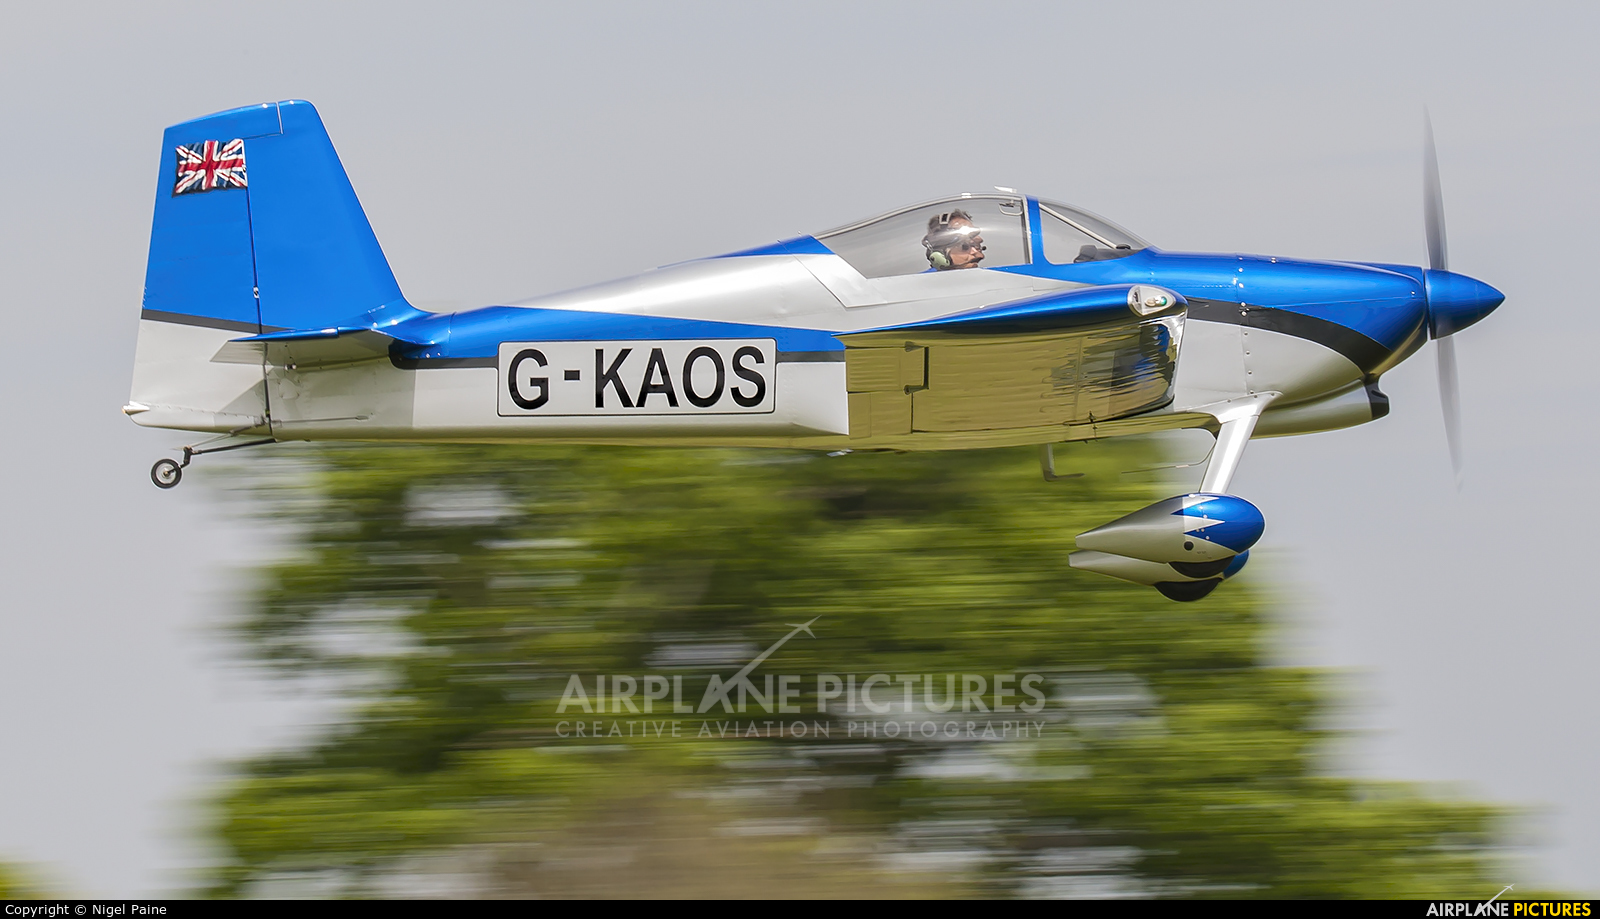 Private G-KAOS aircraft at Lashenden / Headcorn